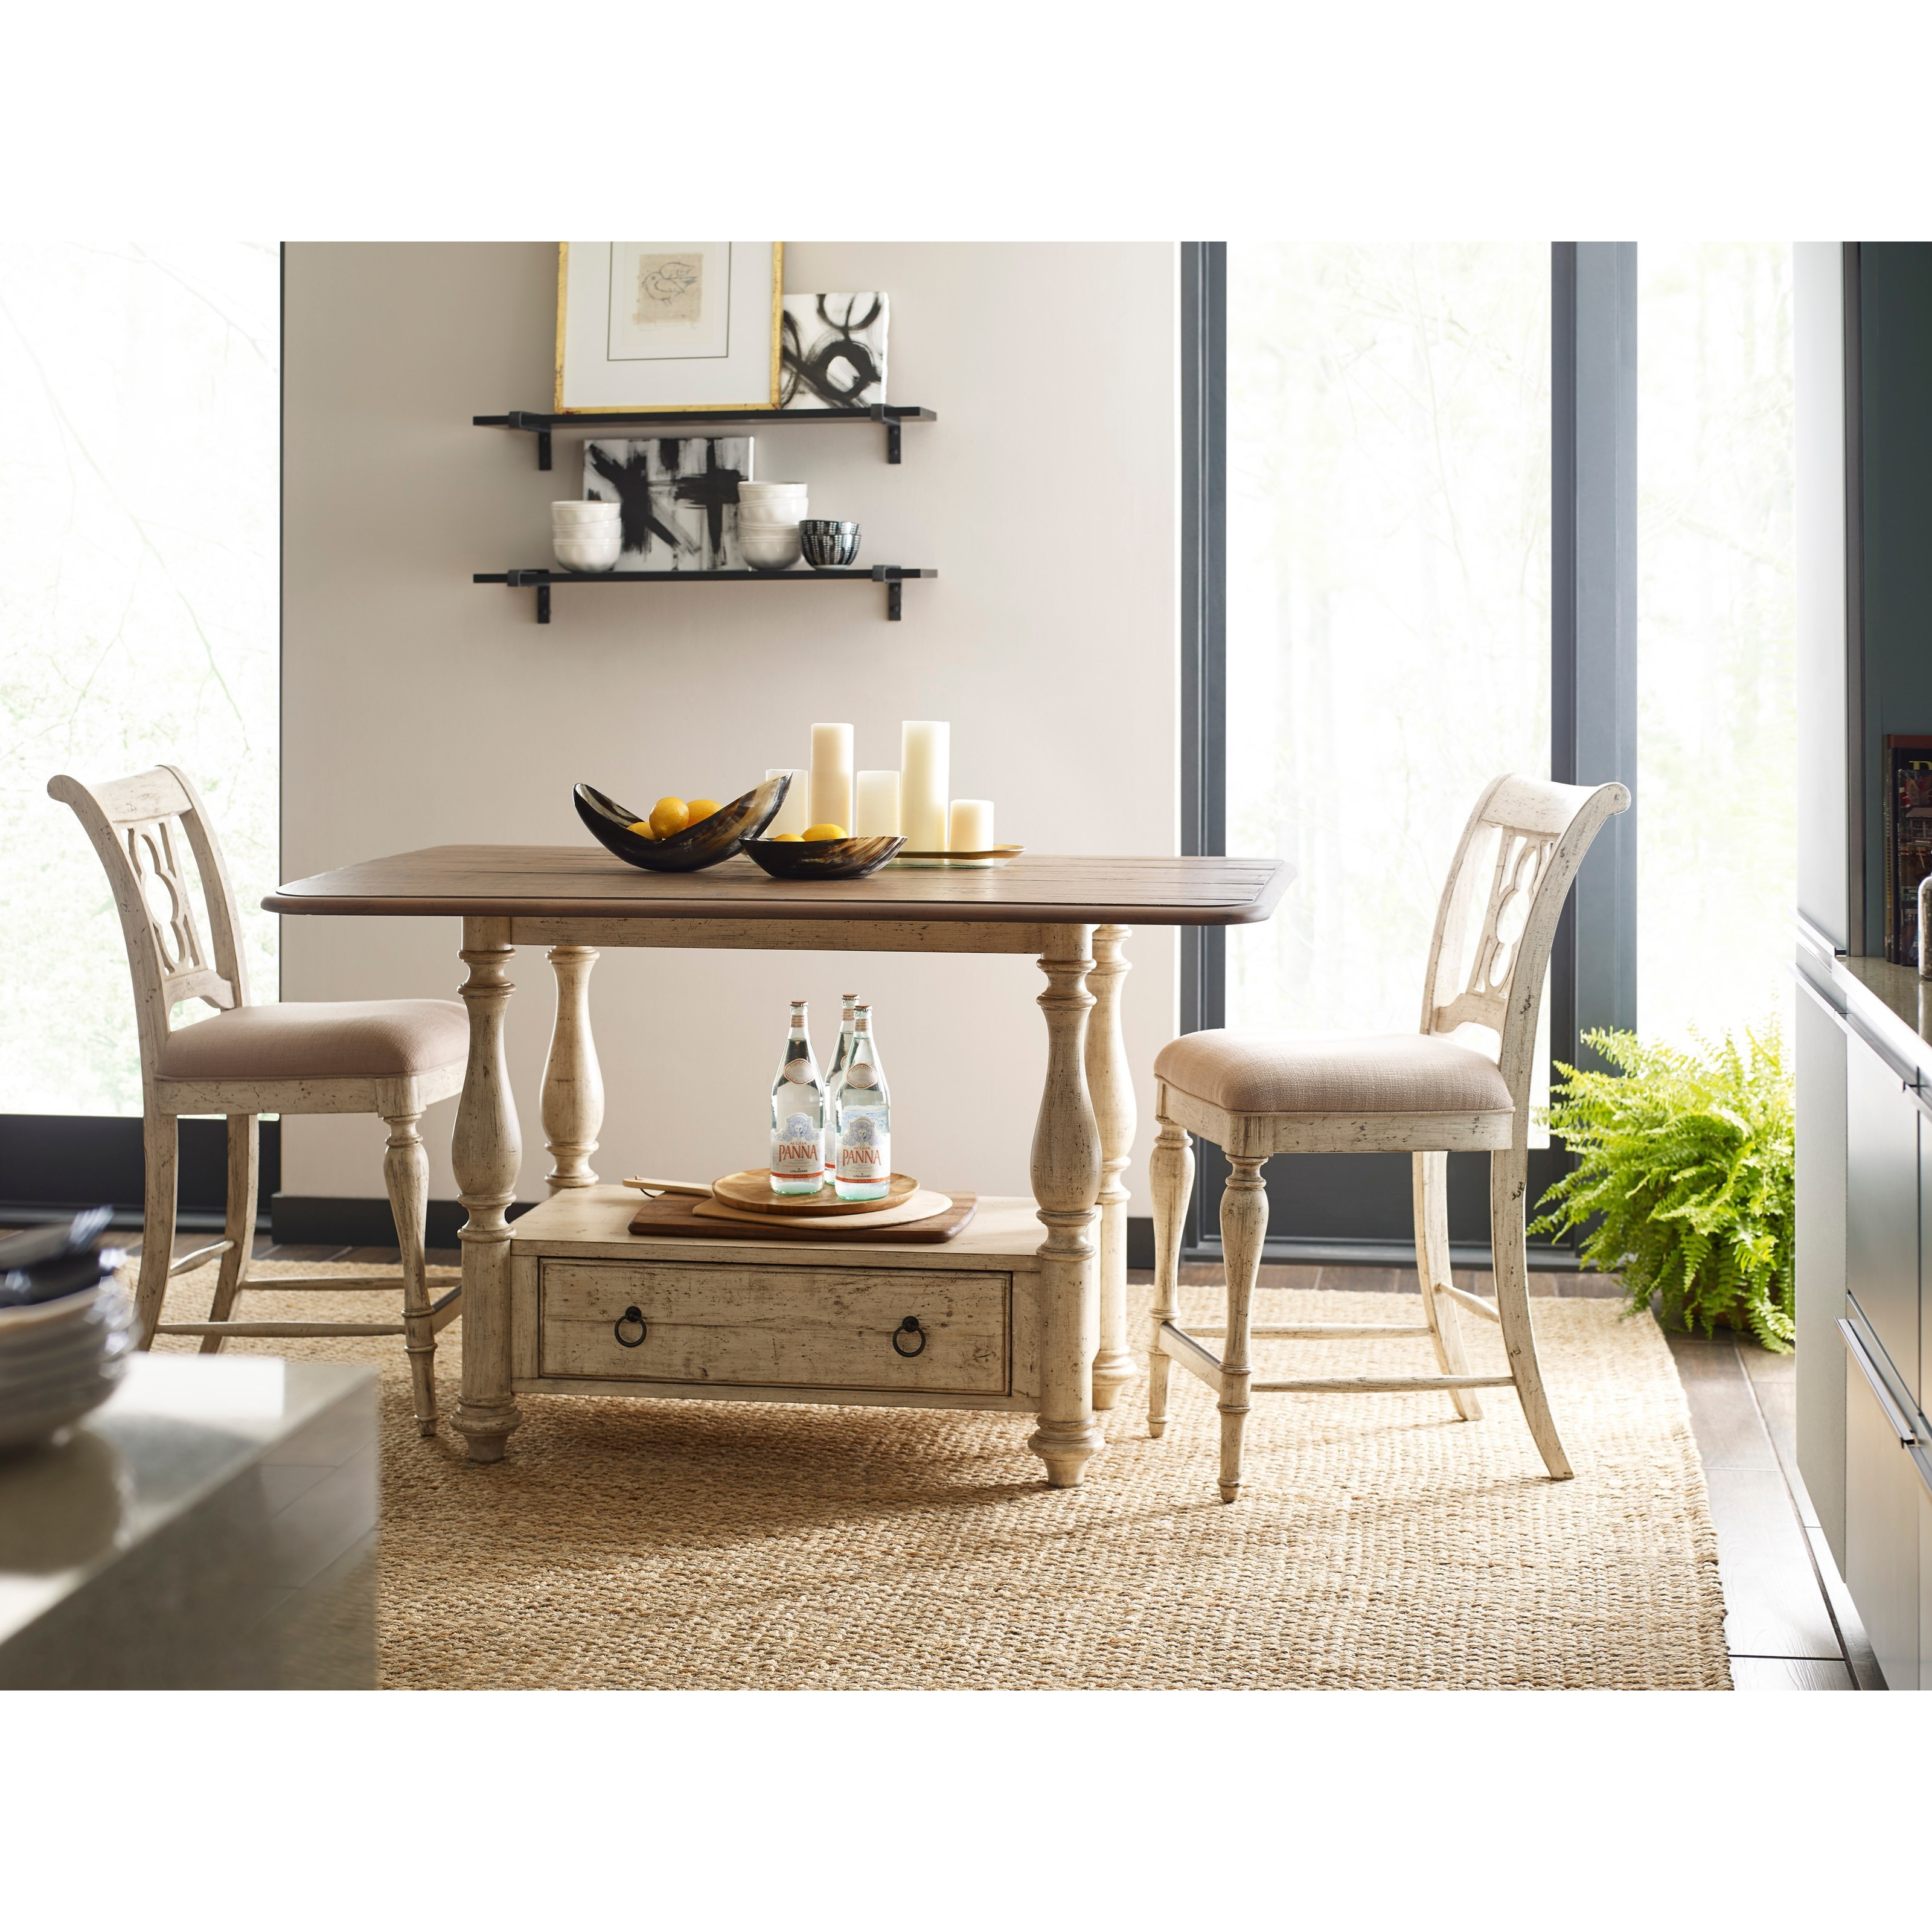 3-Piece Kitchen Island and Chair Set